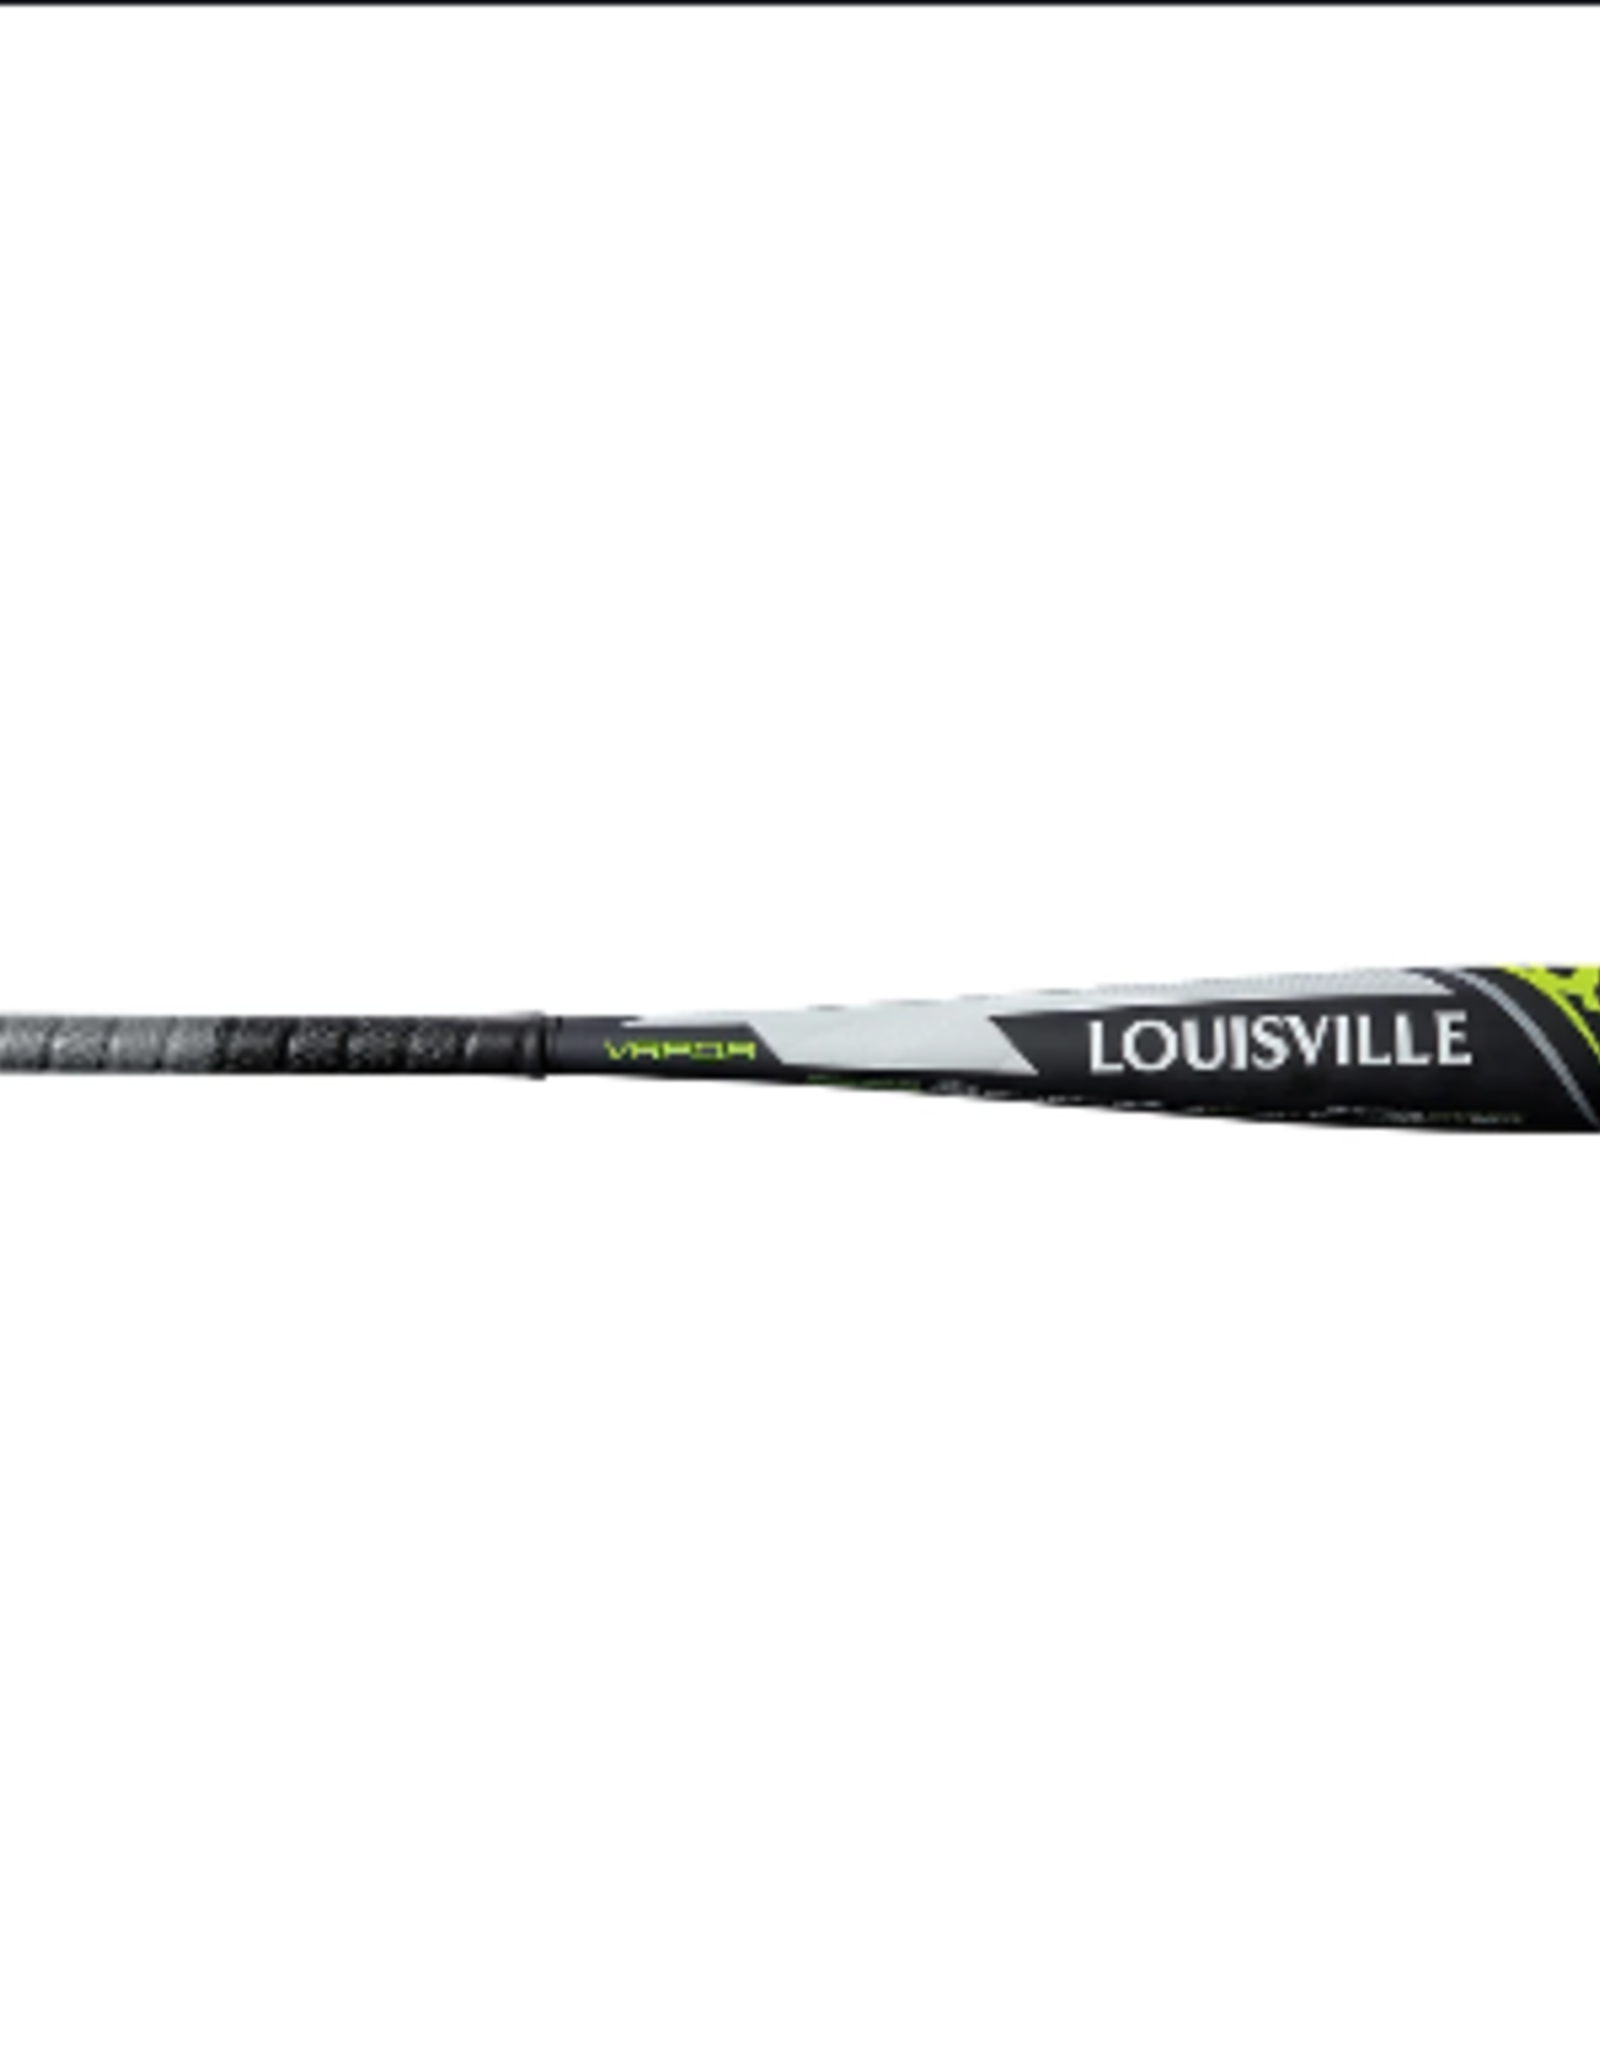 Louisville (Canada) LS LOUISVILLE SLUGGER NON WOOD BAT  USA BASEBALL VAPOR  9 2 5/8 USA BASEBALL 29 BLK-WHITE-GREEN